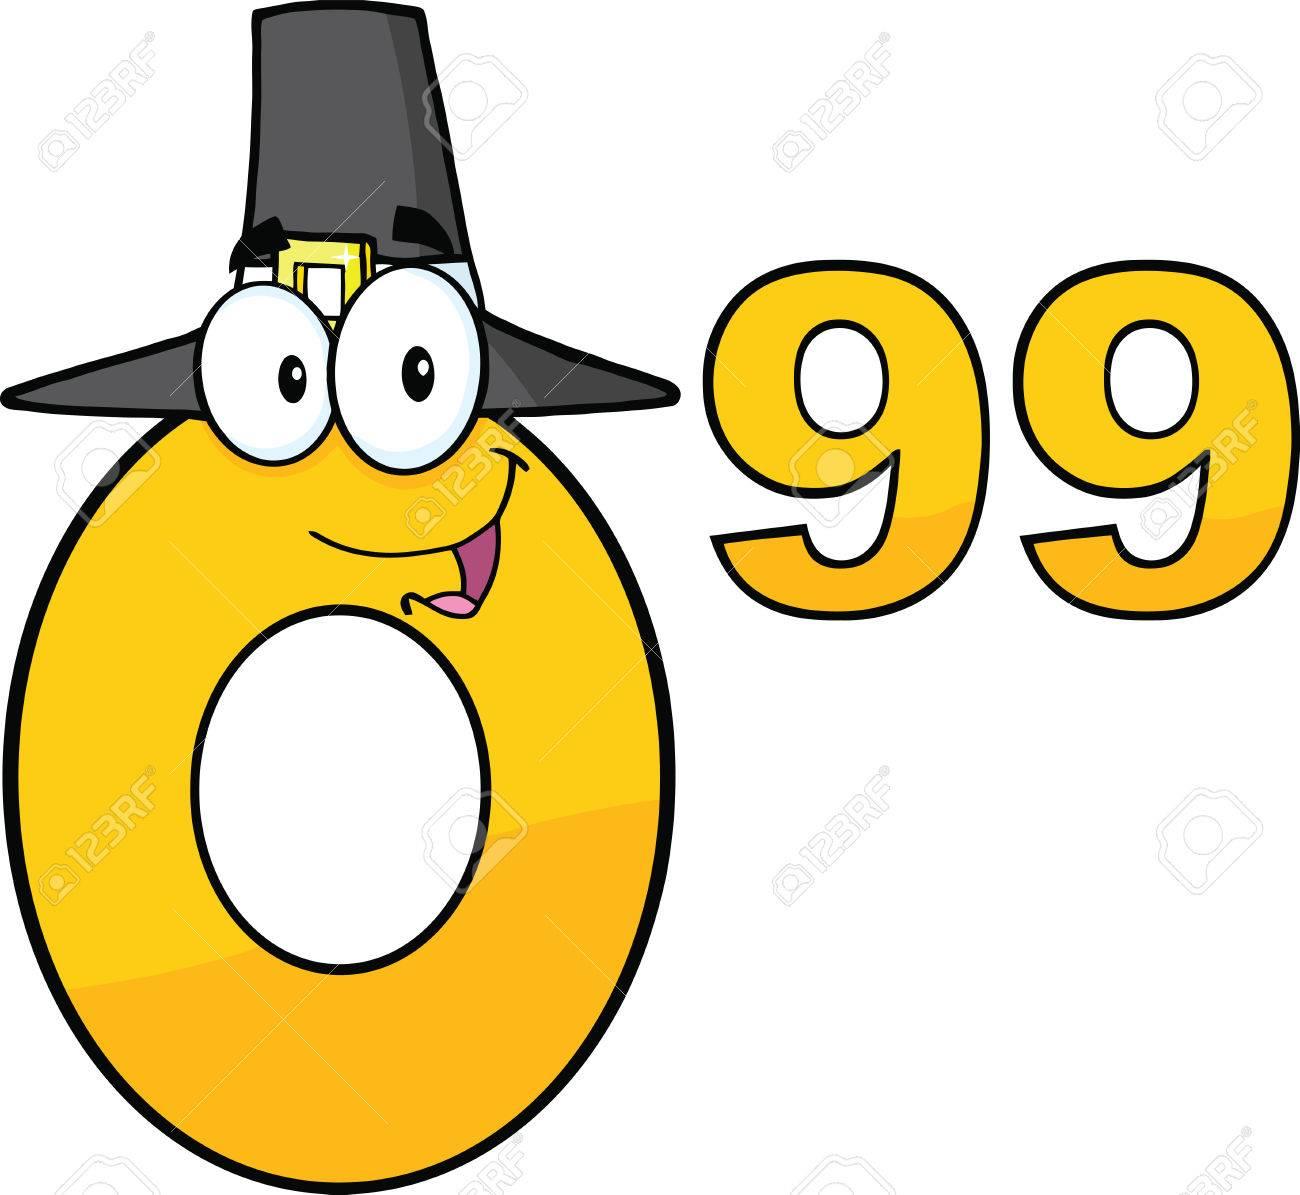 182 mascot price cliparts stock vector and royalty free mascot